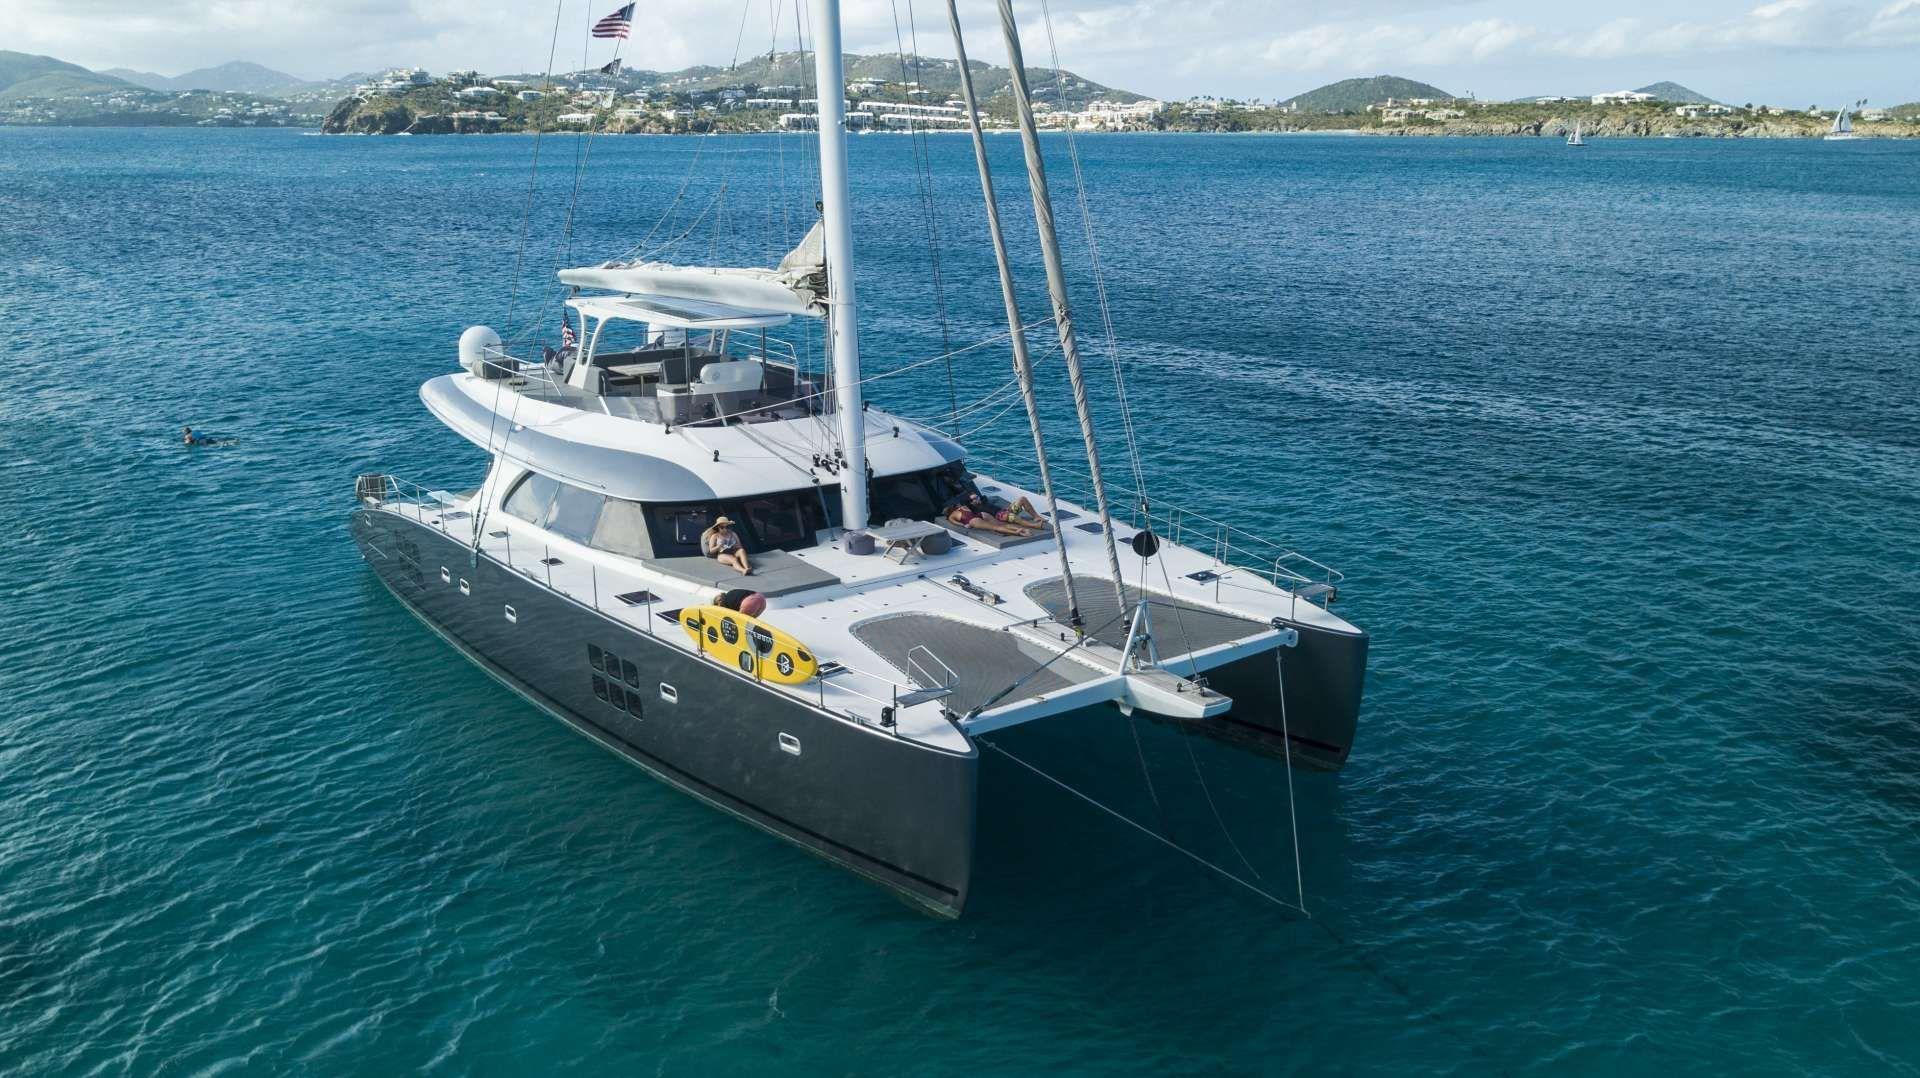 EXCESS Sunreef 70 Crewed Catamaran